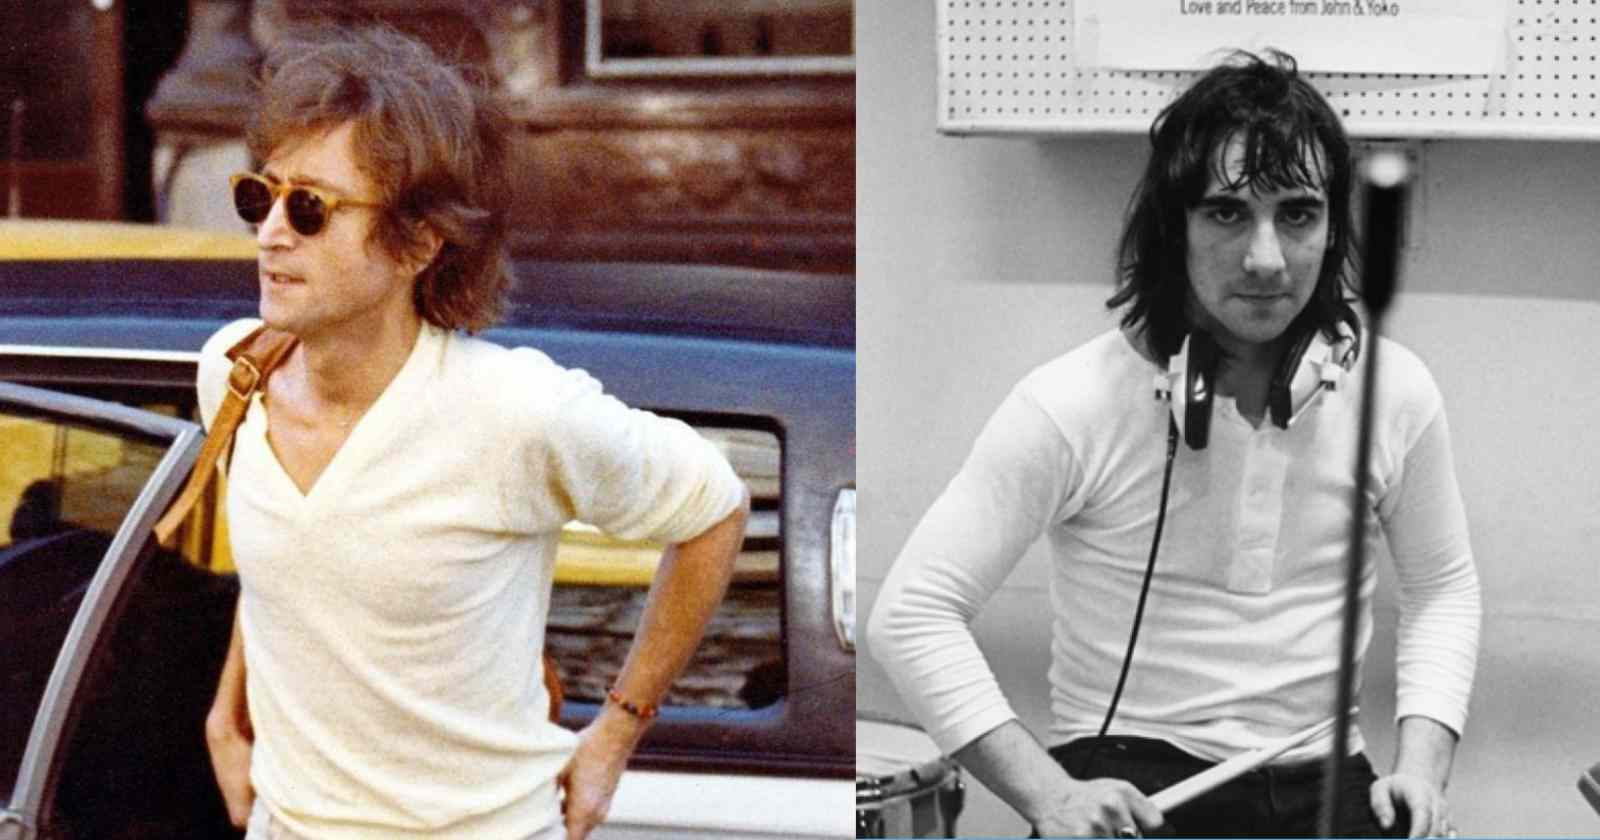 John Lennon Keith Moon